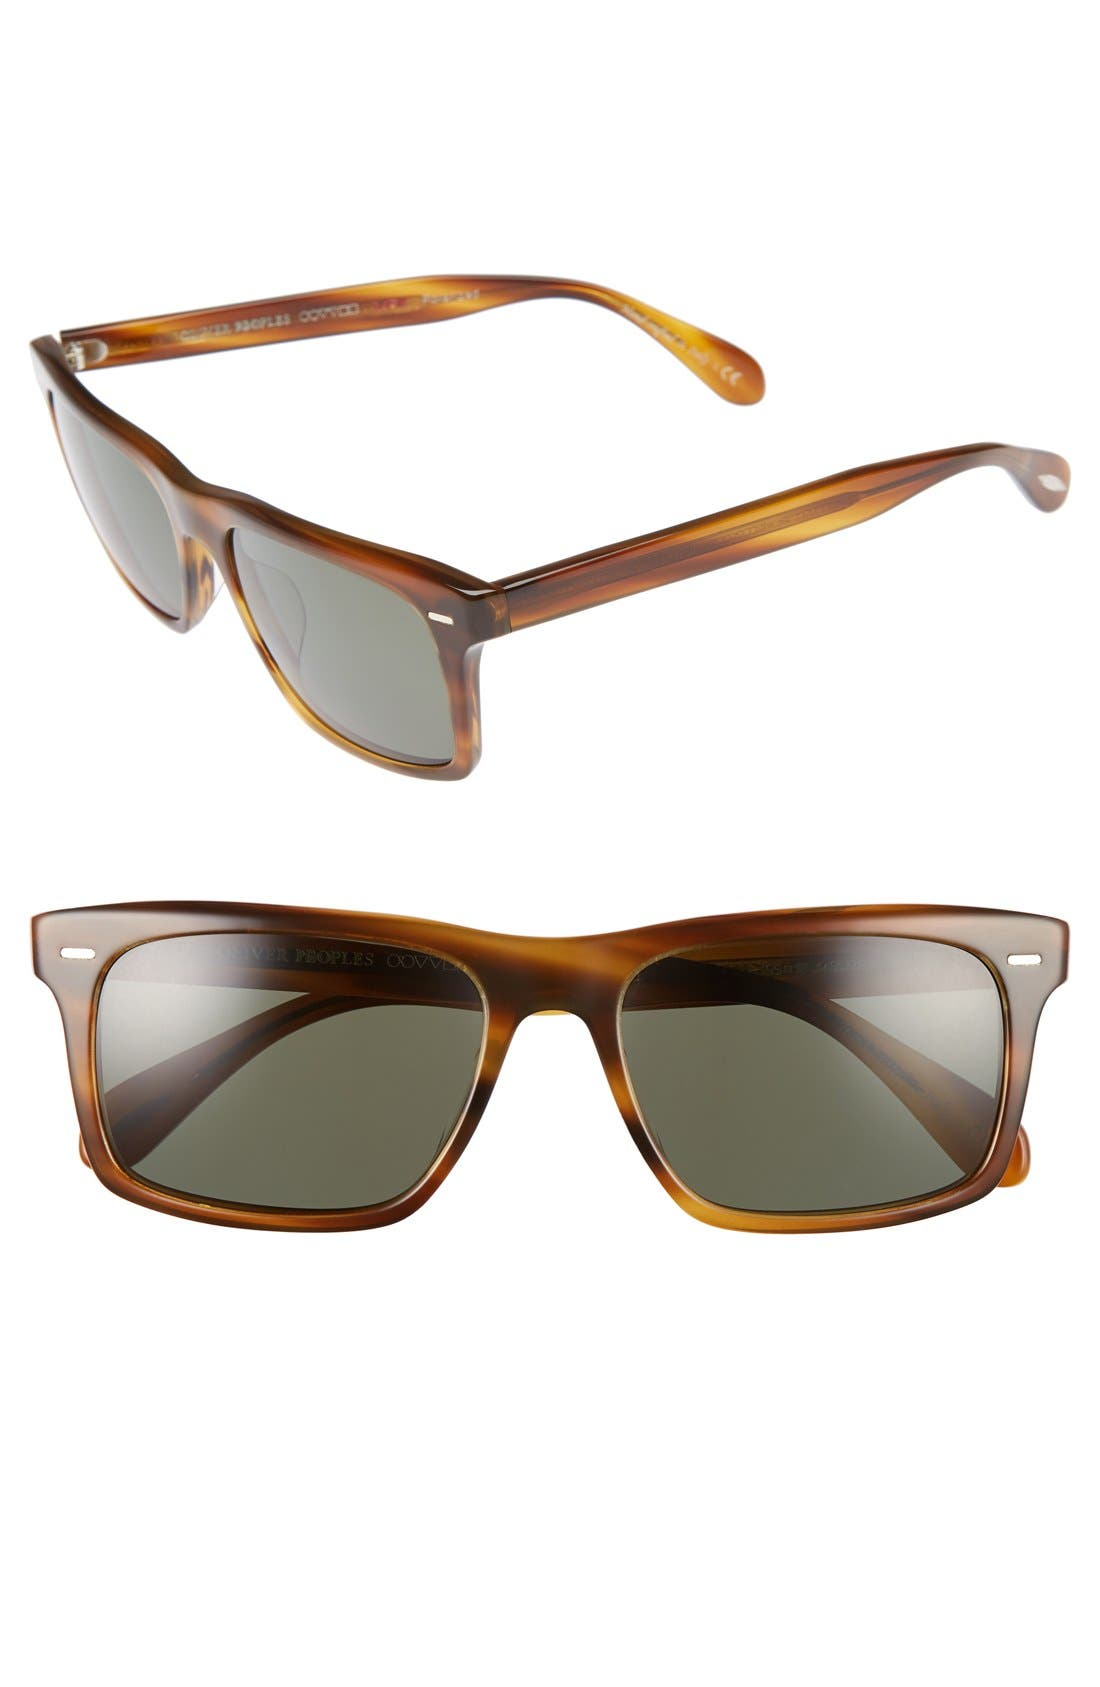 Brodsky 55mm Polarized Sunglasses,                         Main,                         color, Brown